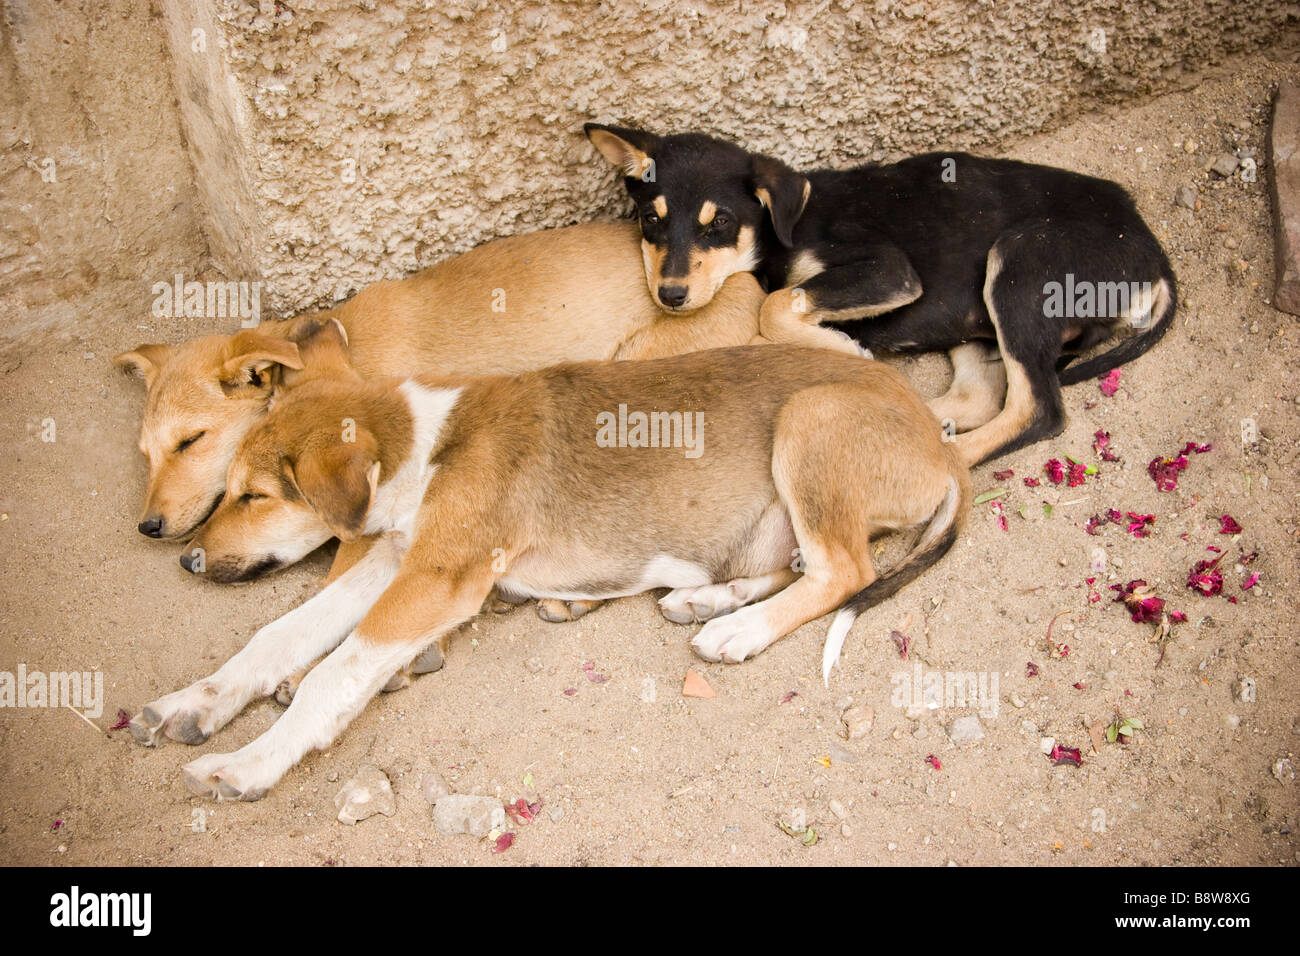 Puppy dogs Pushkar Rajasthan India - Stock Image